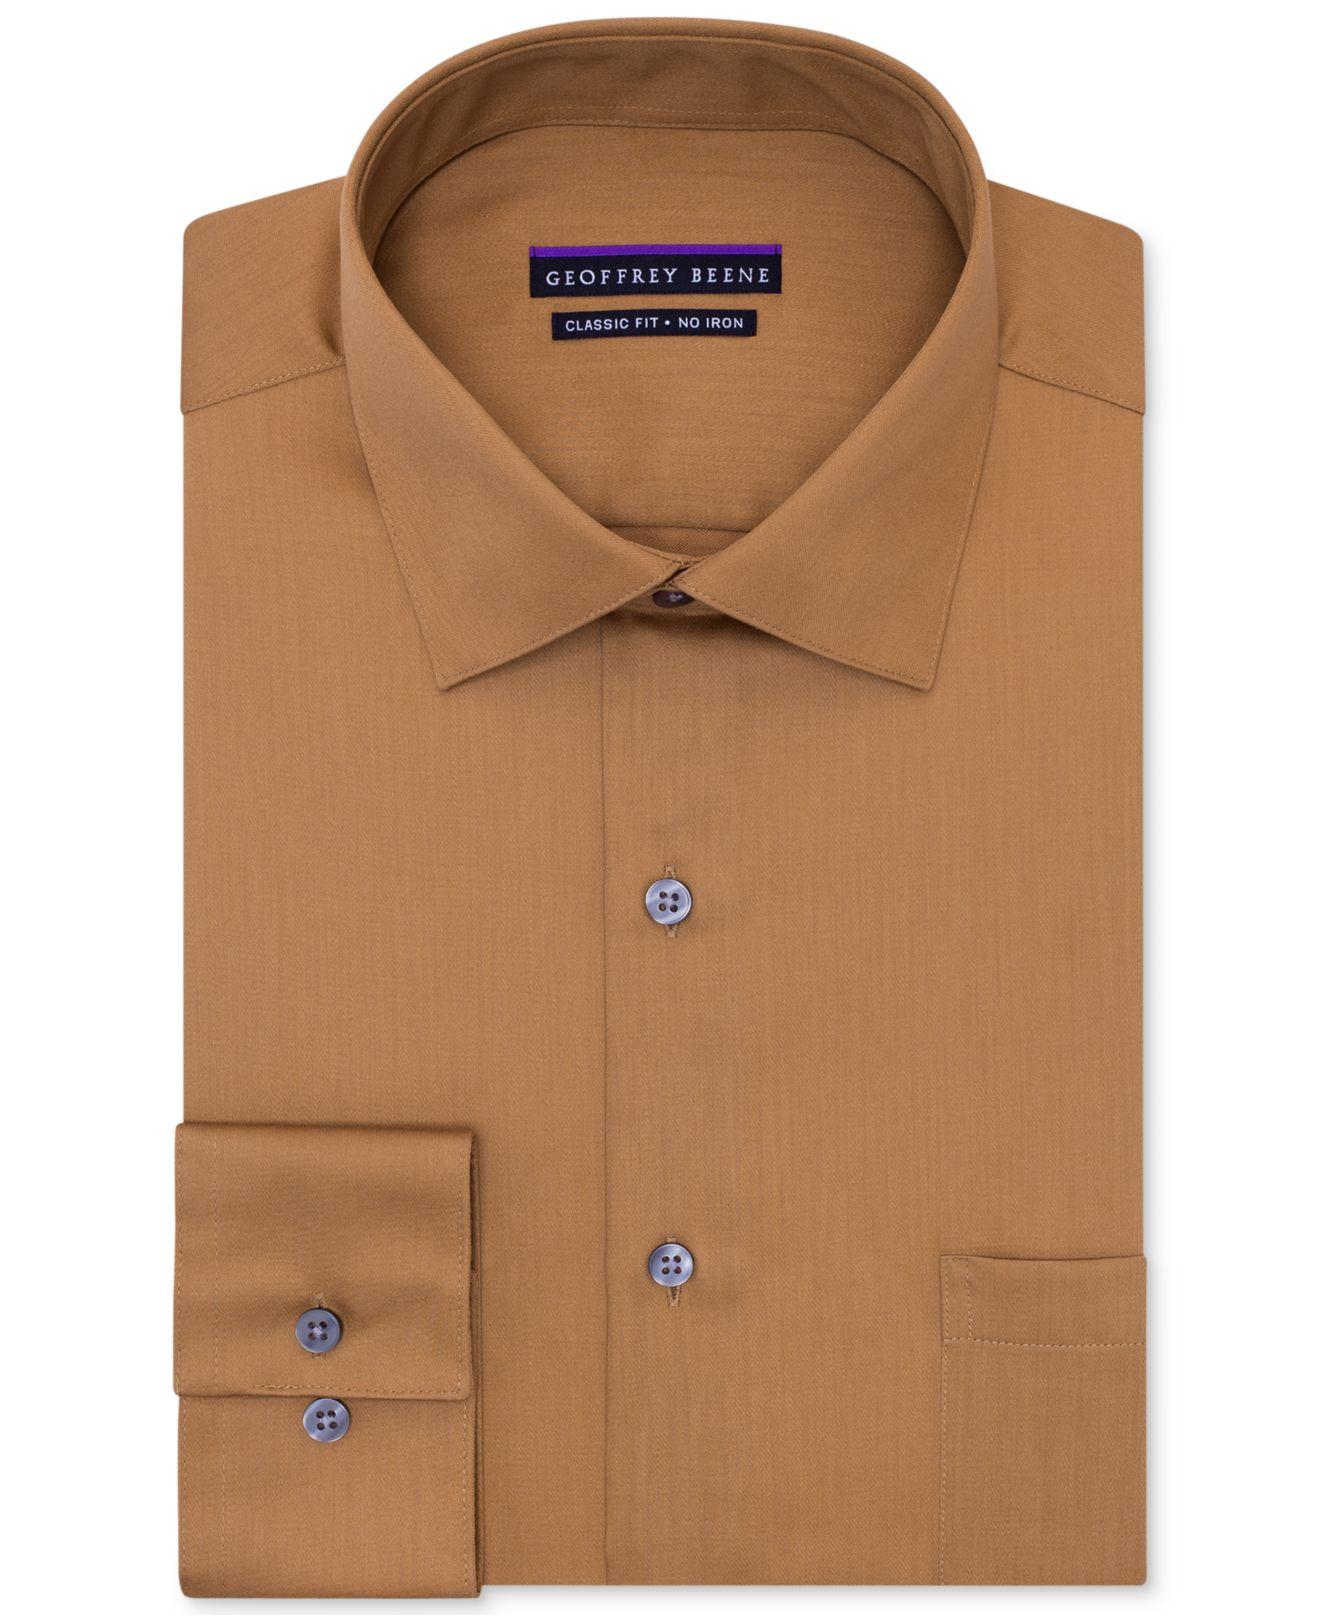 Geoffrey Beene Non-Iron Sateen Solid Dress Shirt In Brown For Men | Lyst